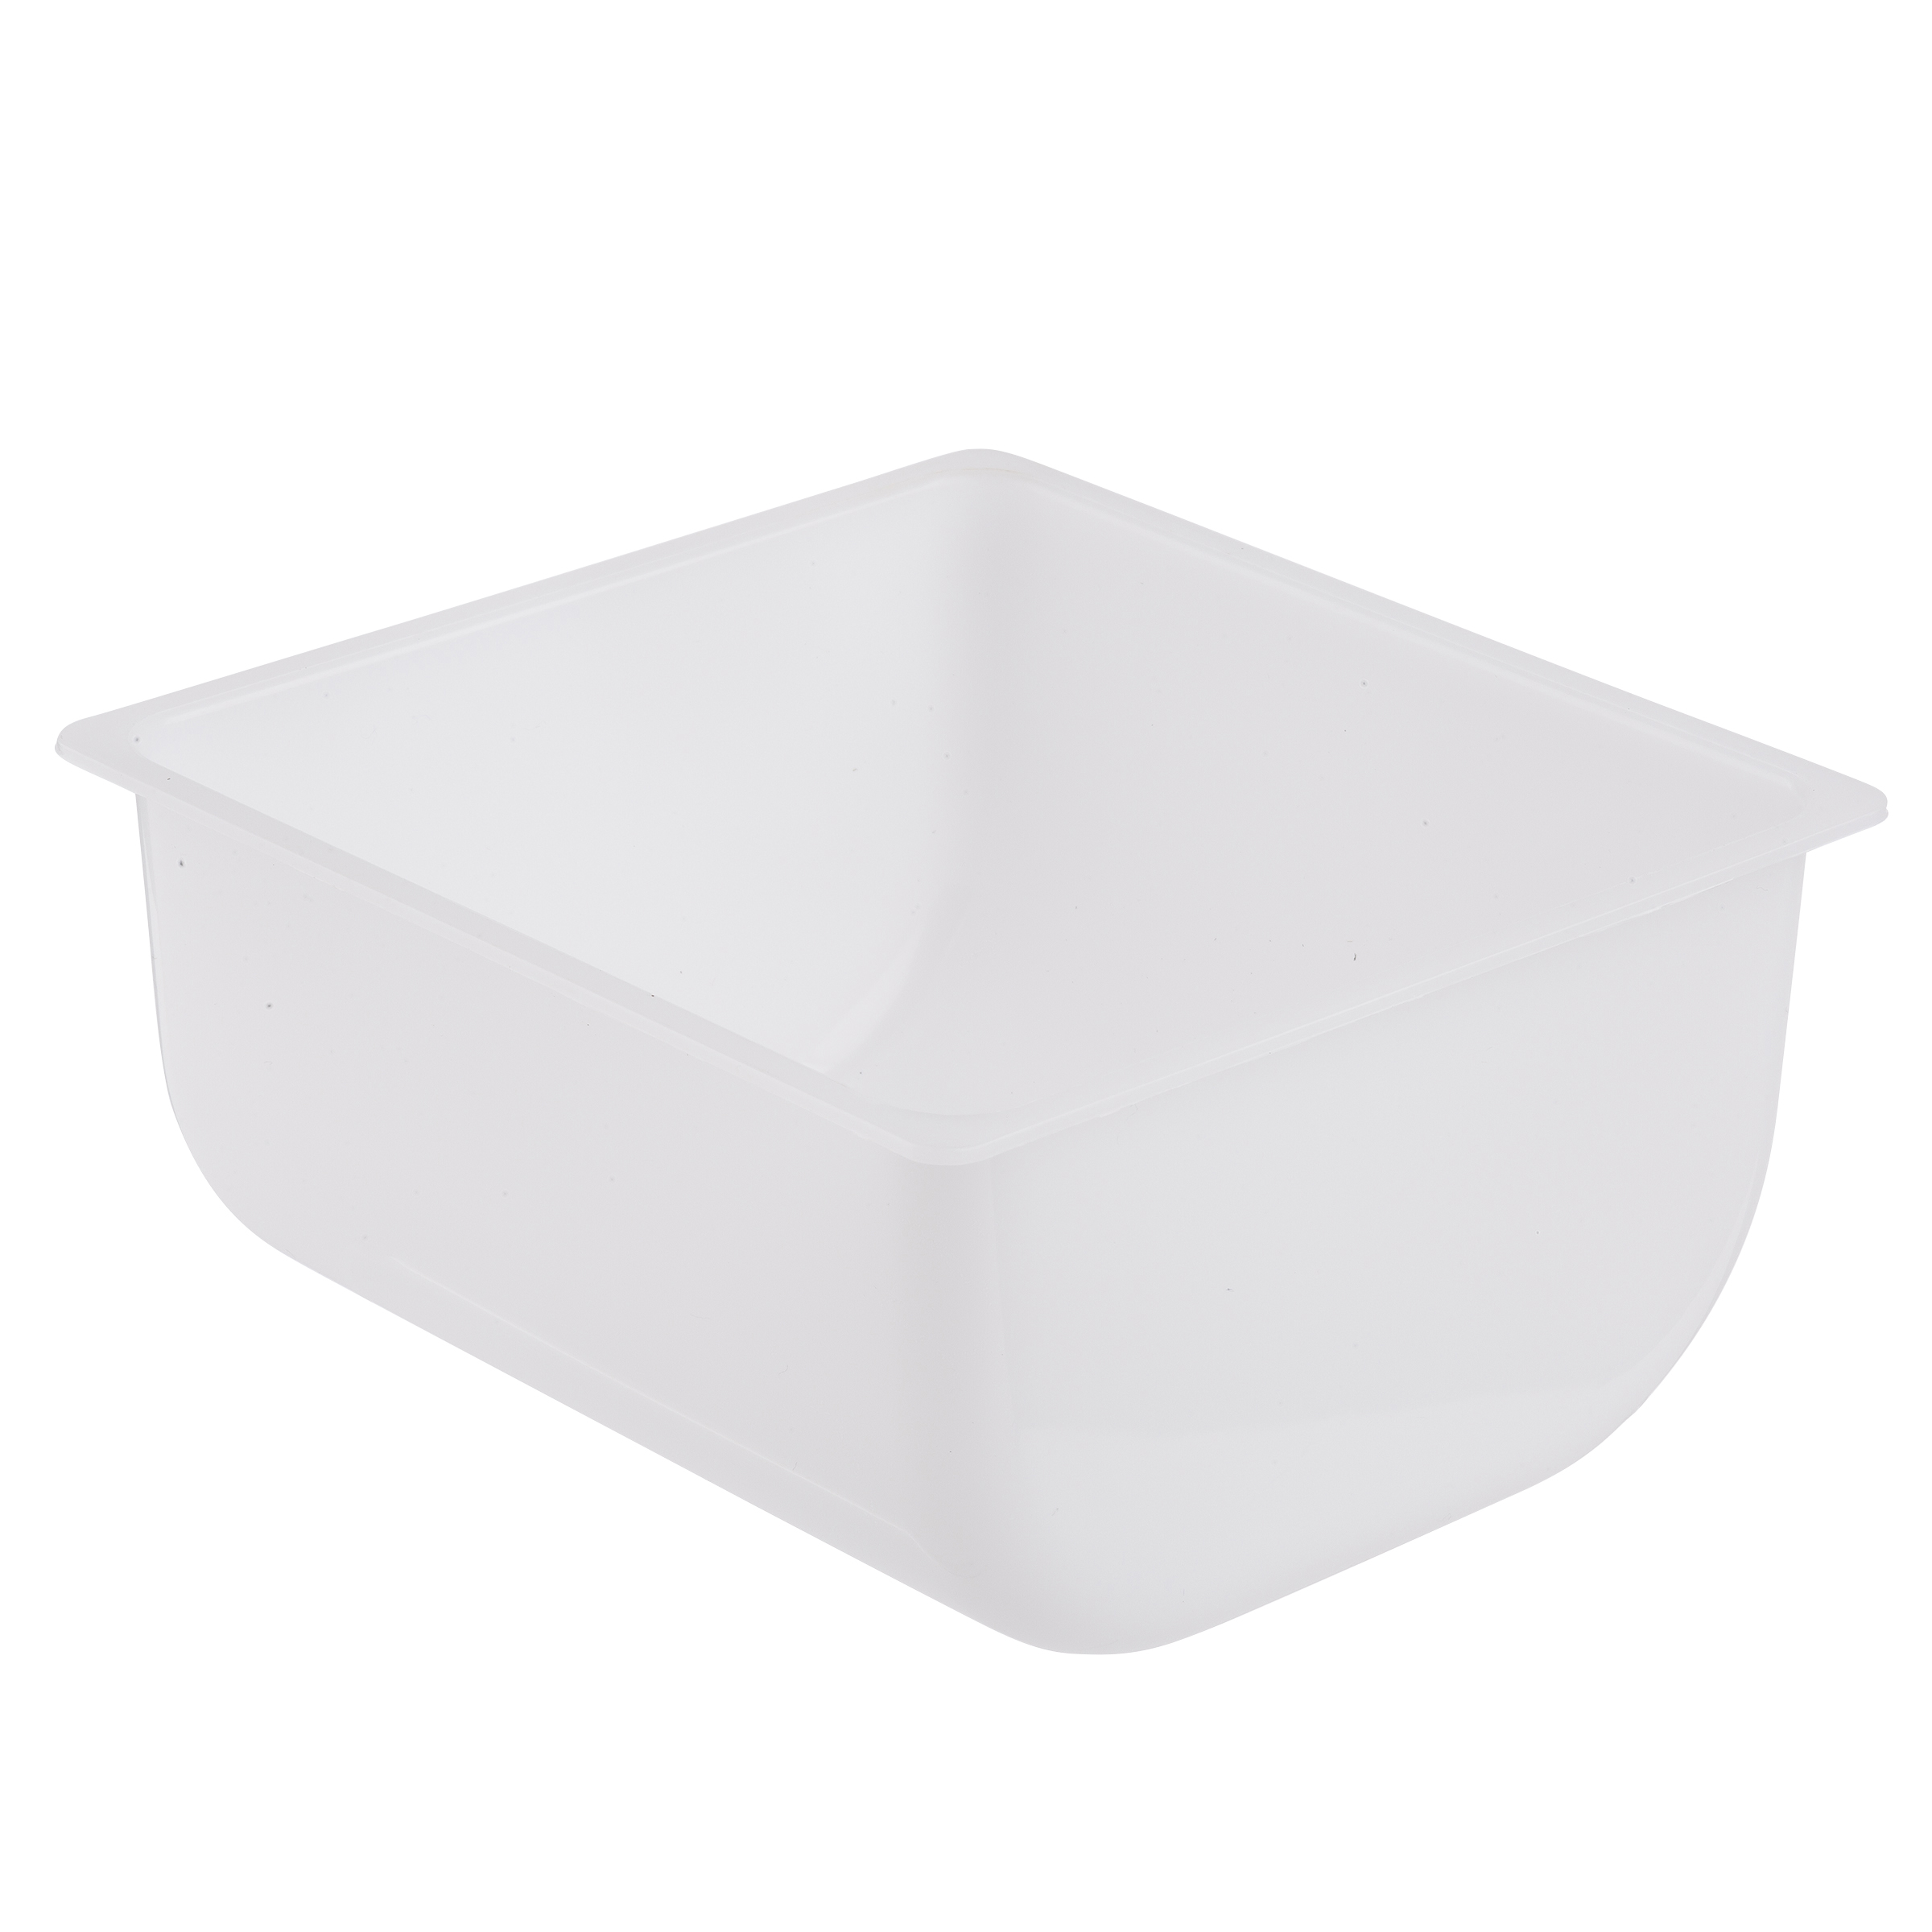 TableCraft Products 107 bar supplies & equipment